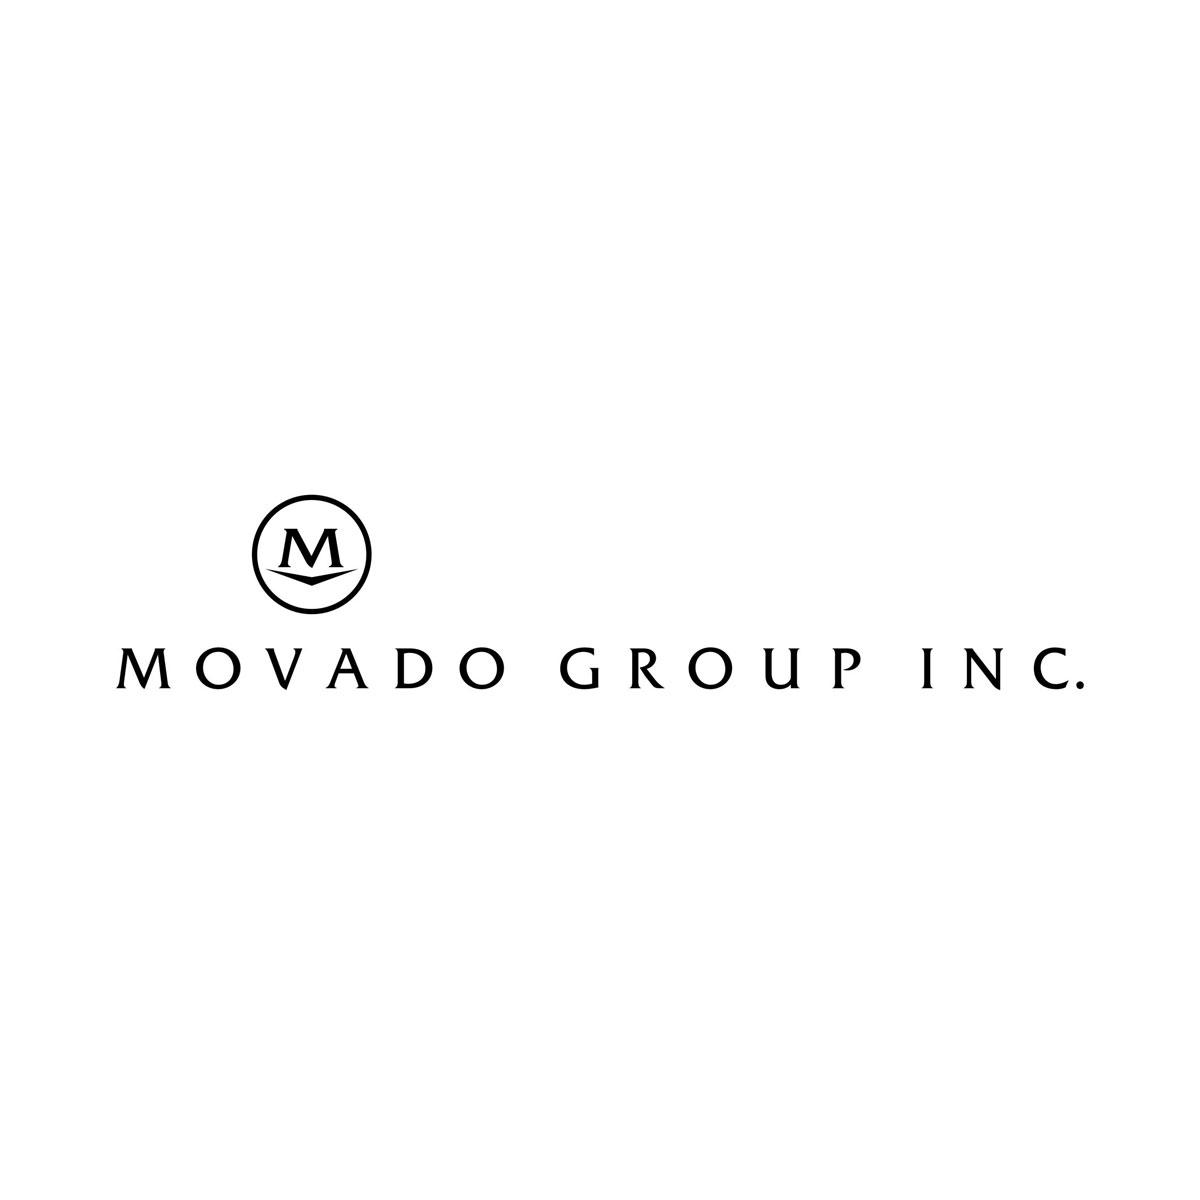 Movado Group, Inc.